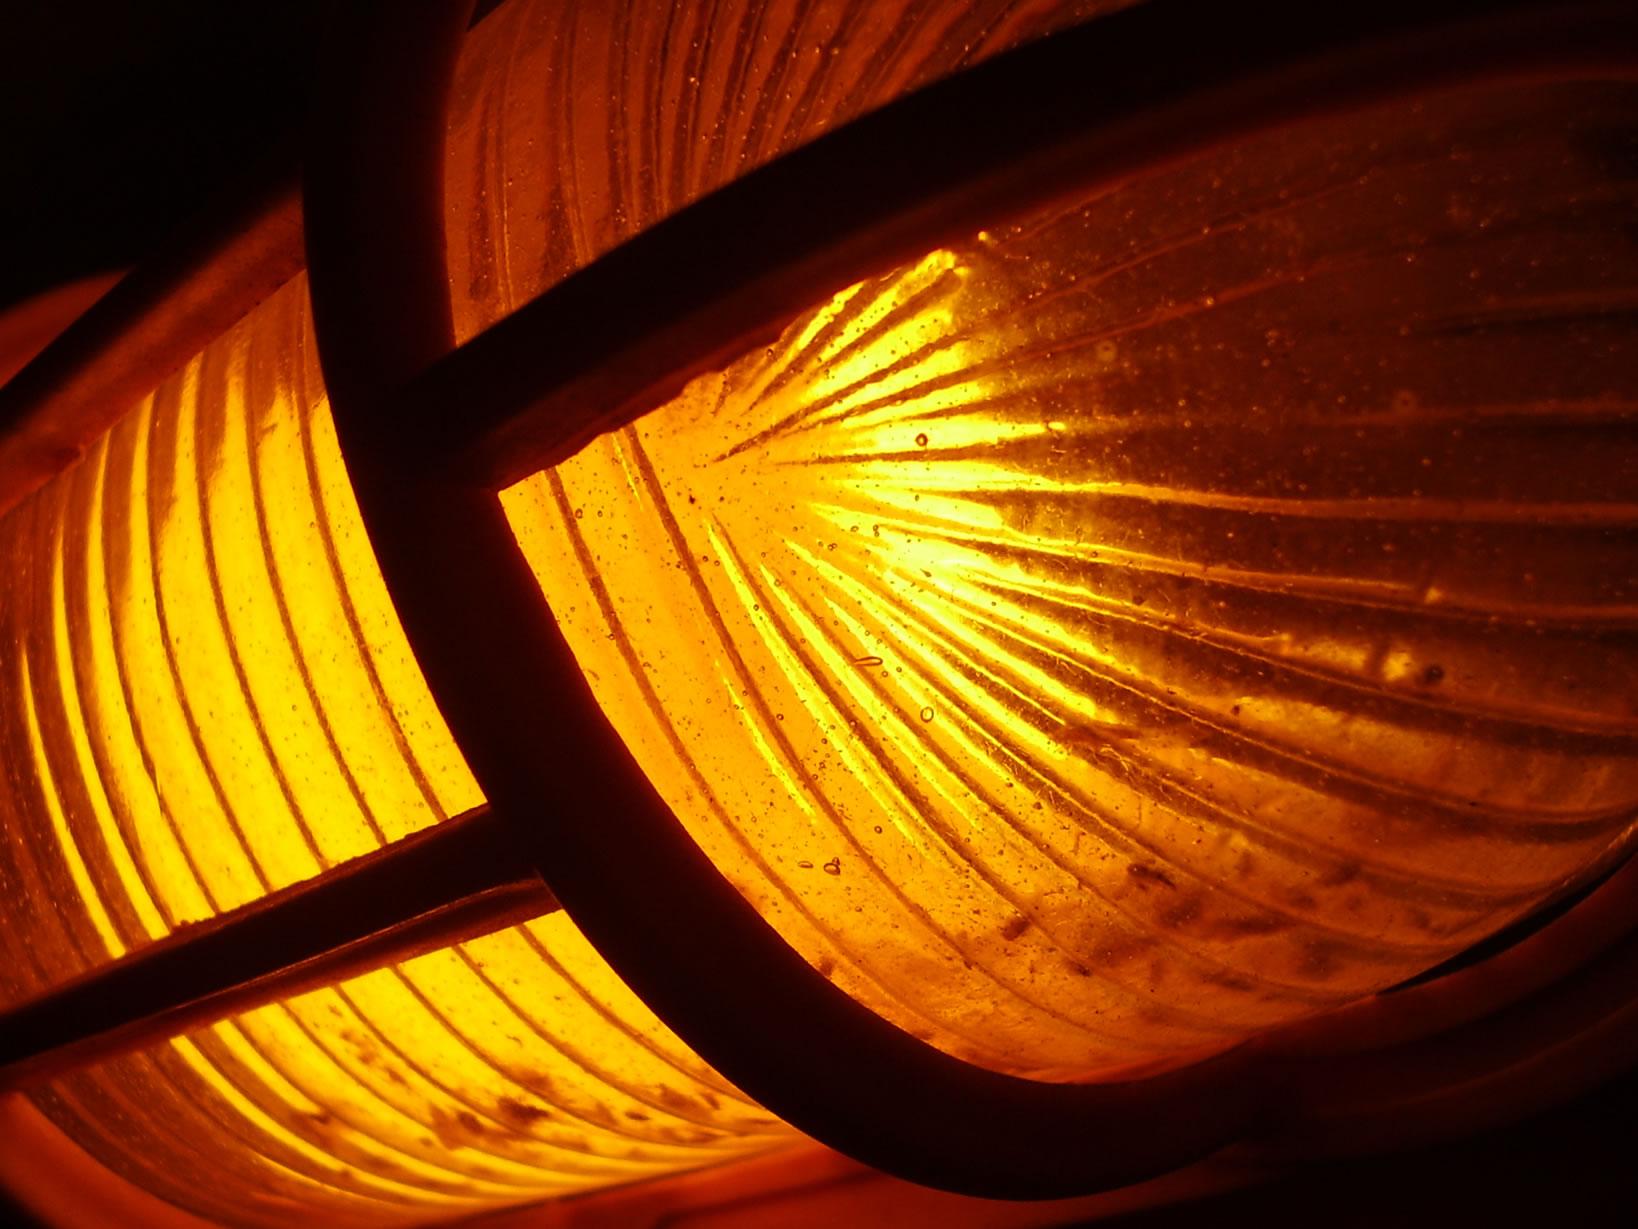 pepelui light golden lamp yellow bright